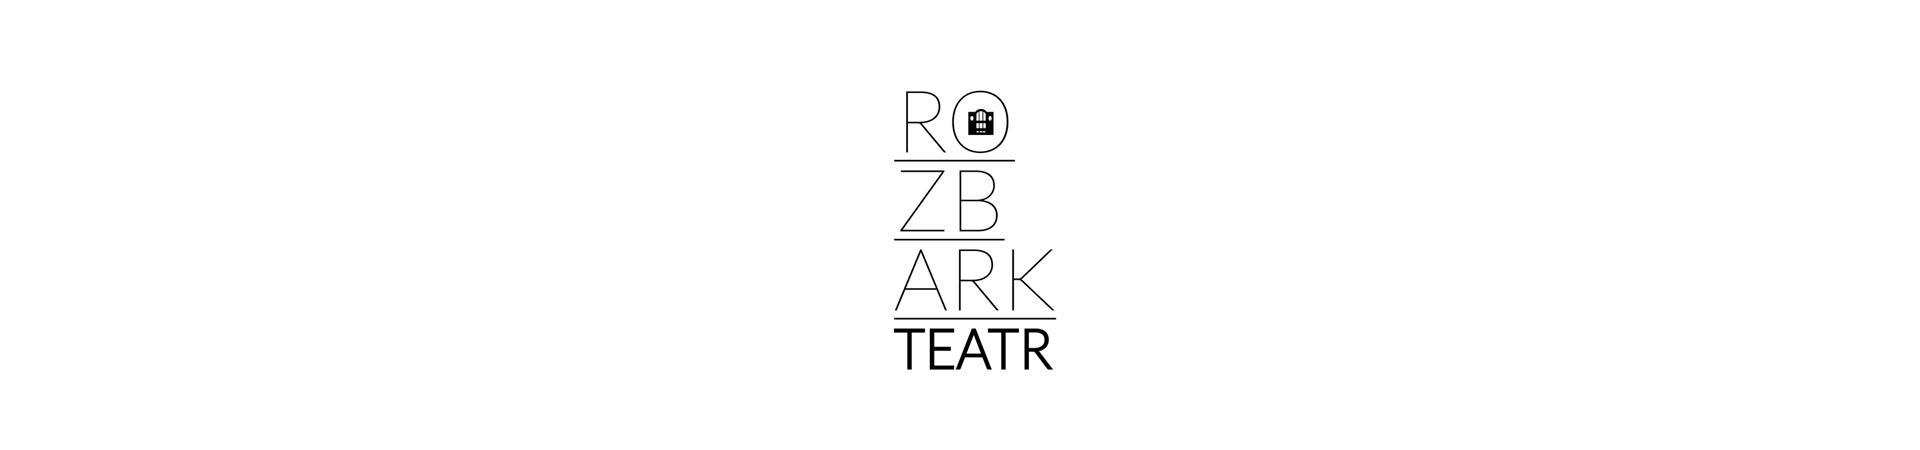 Rozkosz-logo